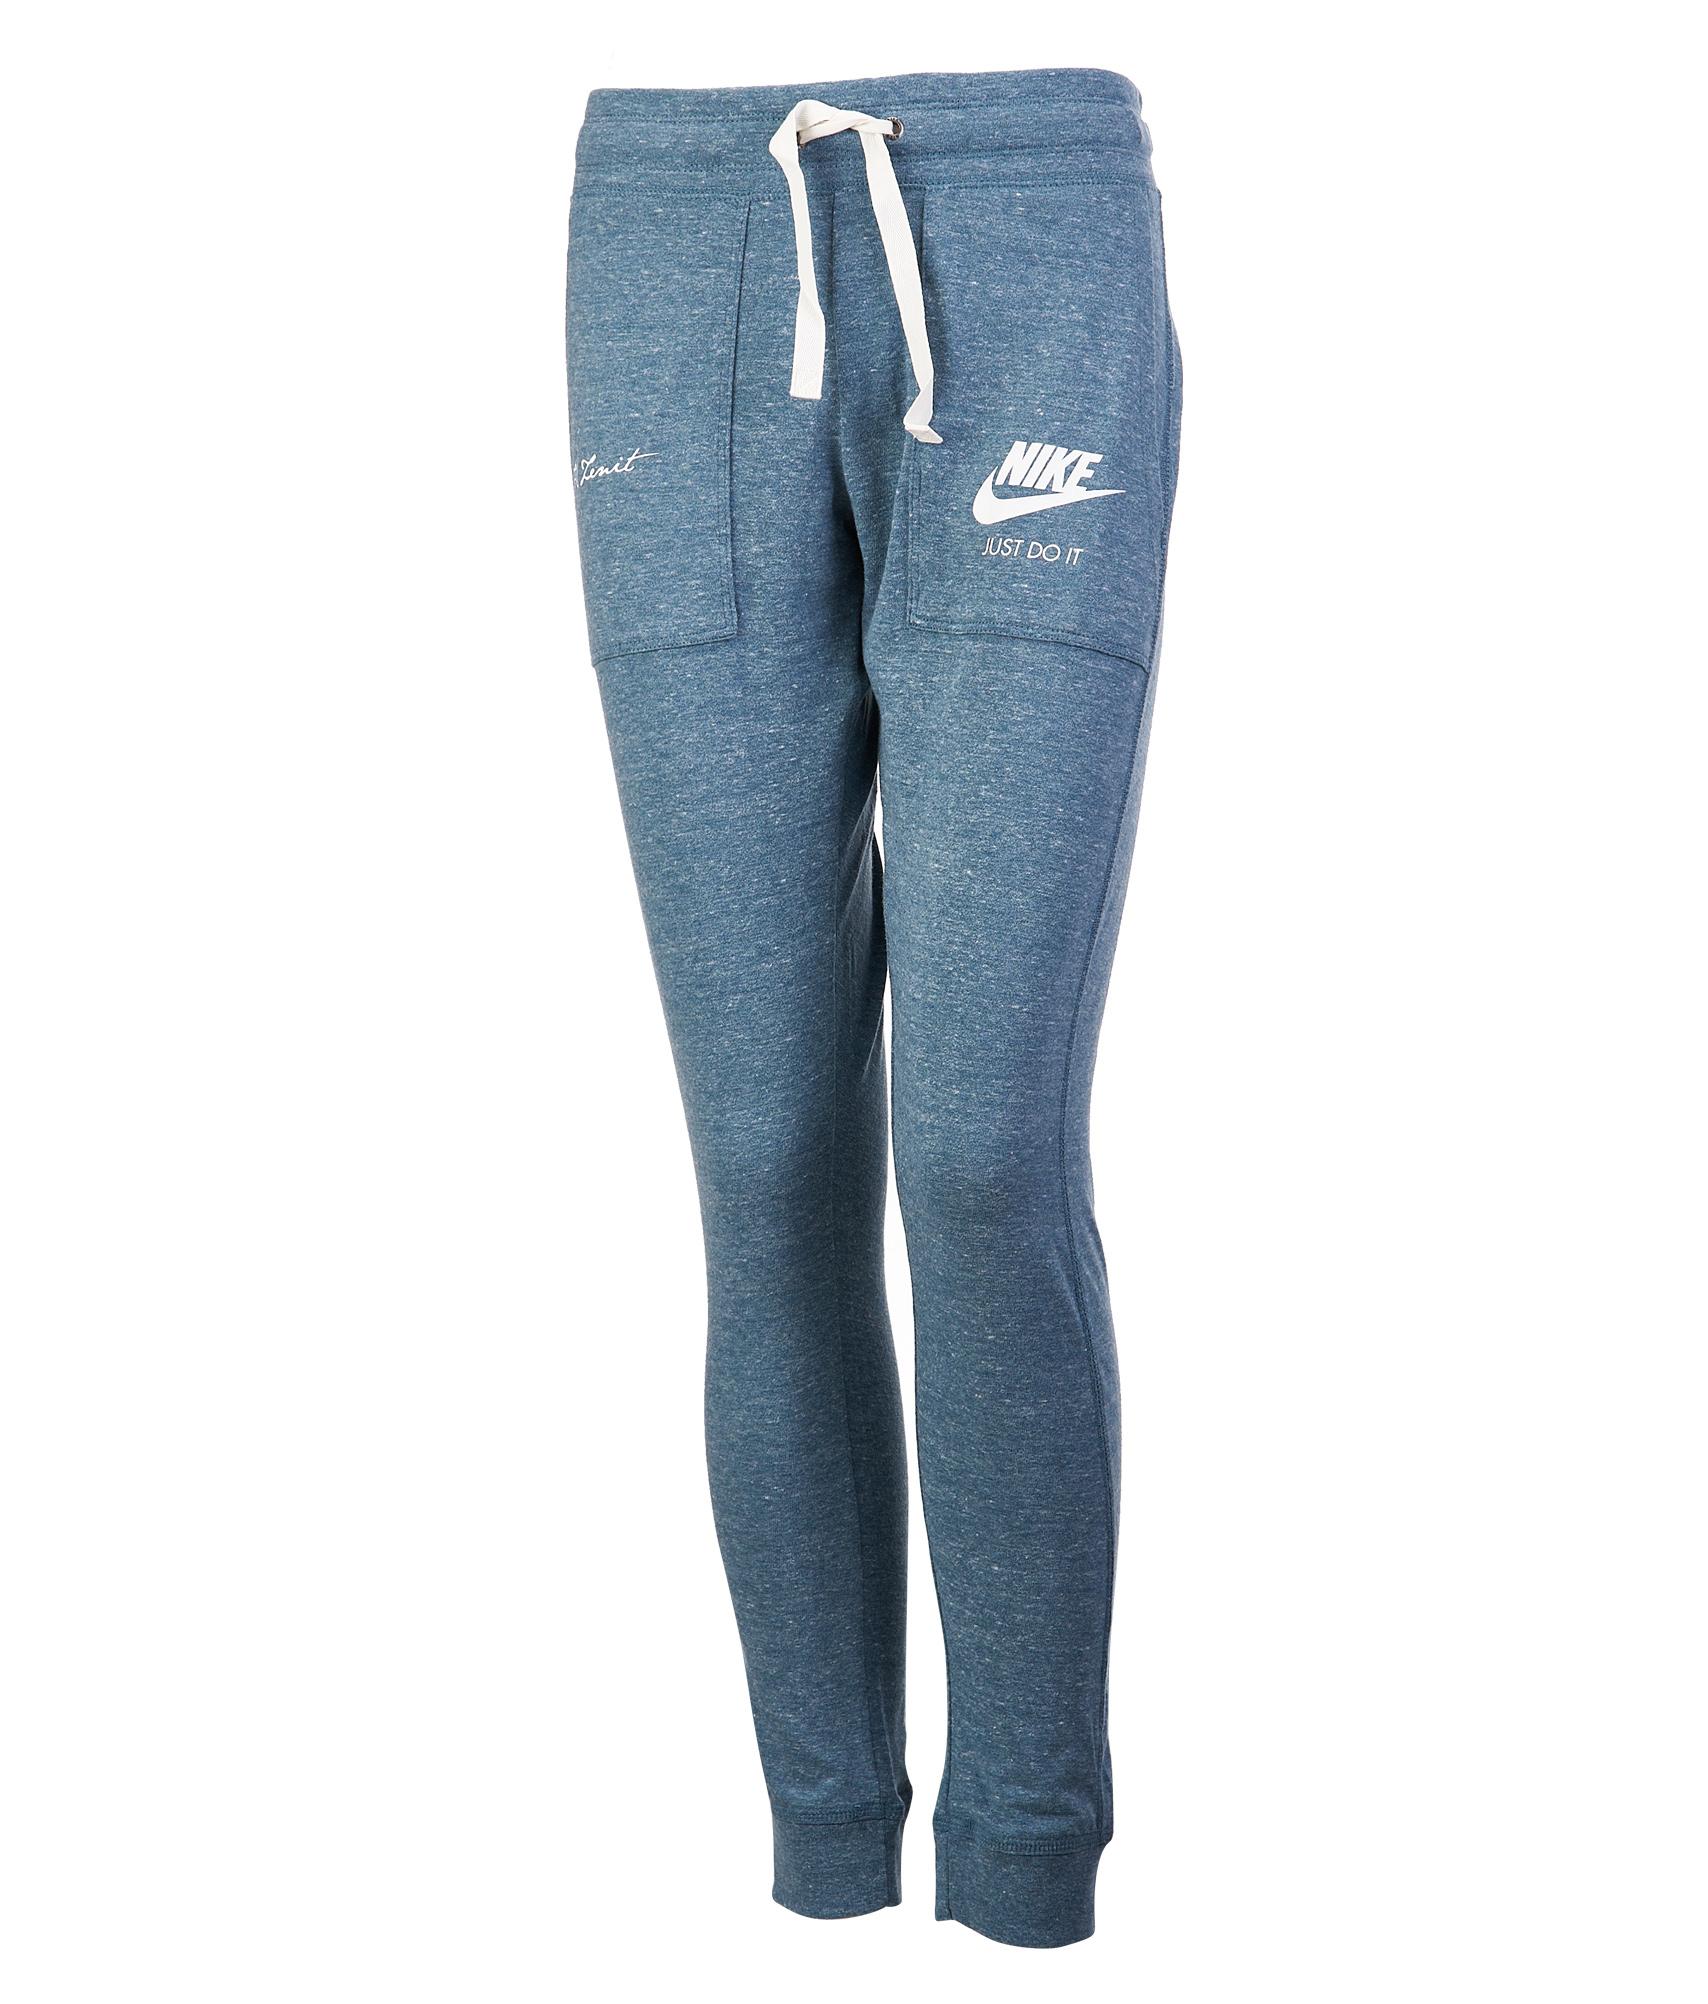 Брюки женские NIKE Nike Цвет-Синий nike перчатки для фитнеса женские nike accessories